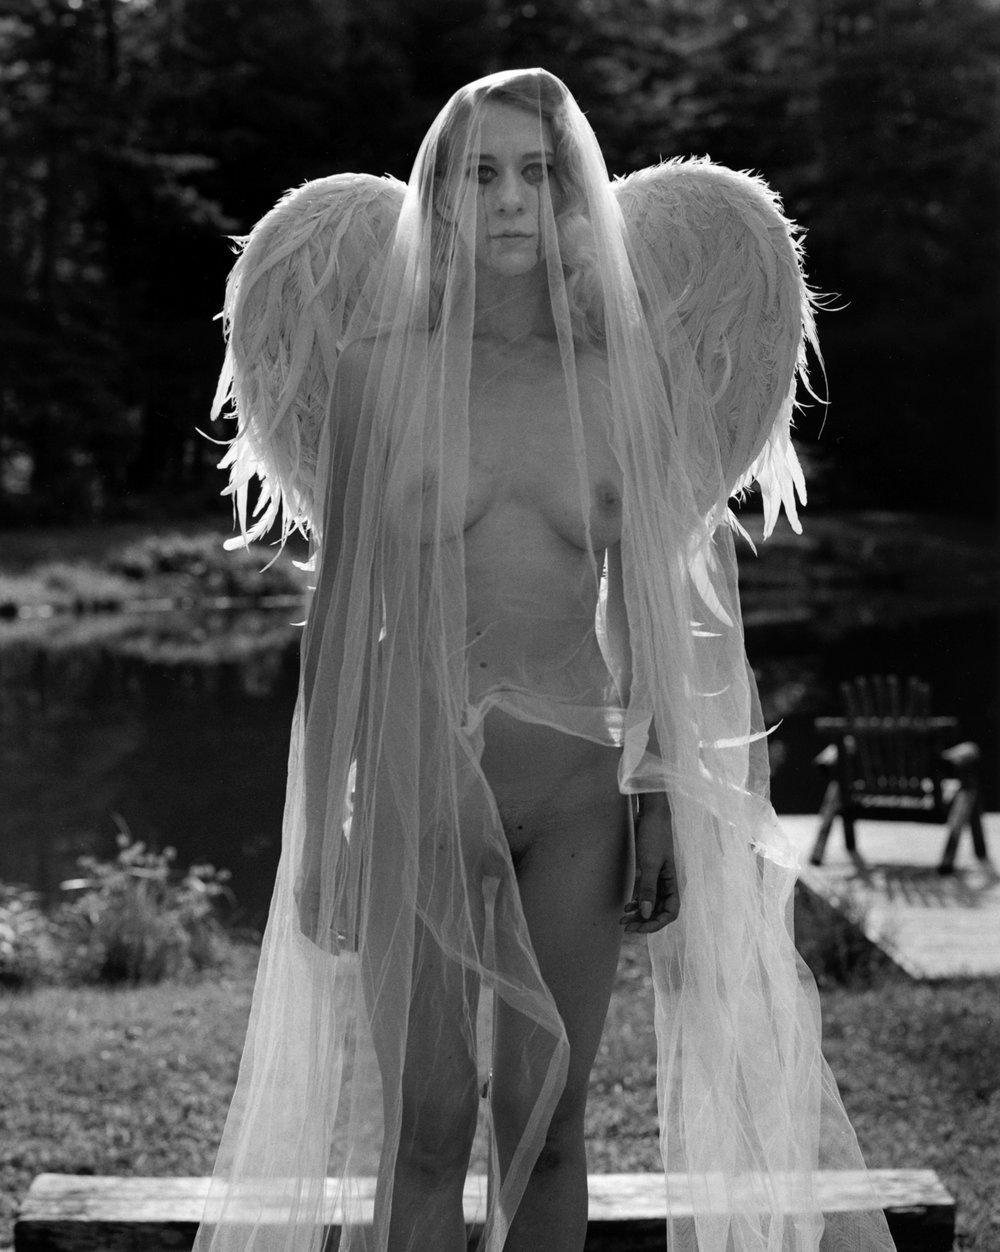 ©Kim-Weston-Holz-2018-The-Archangel.jpg